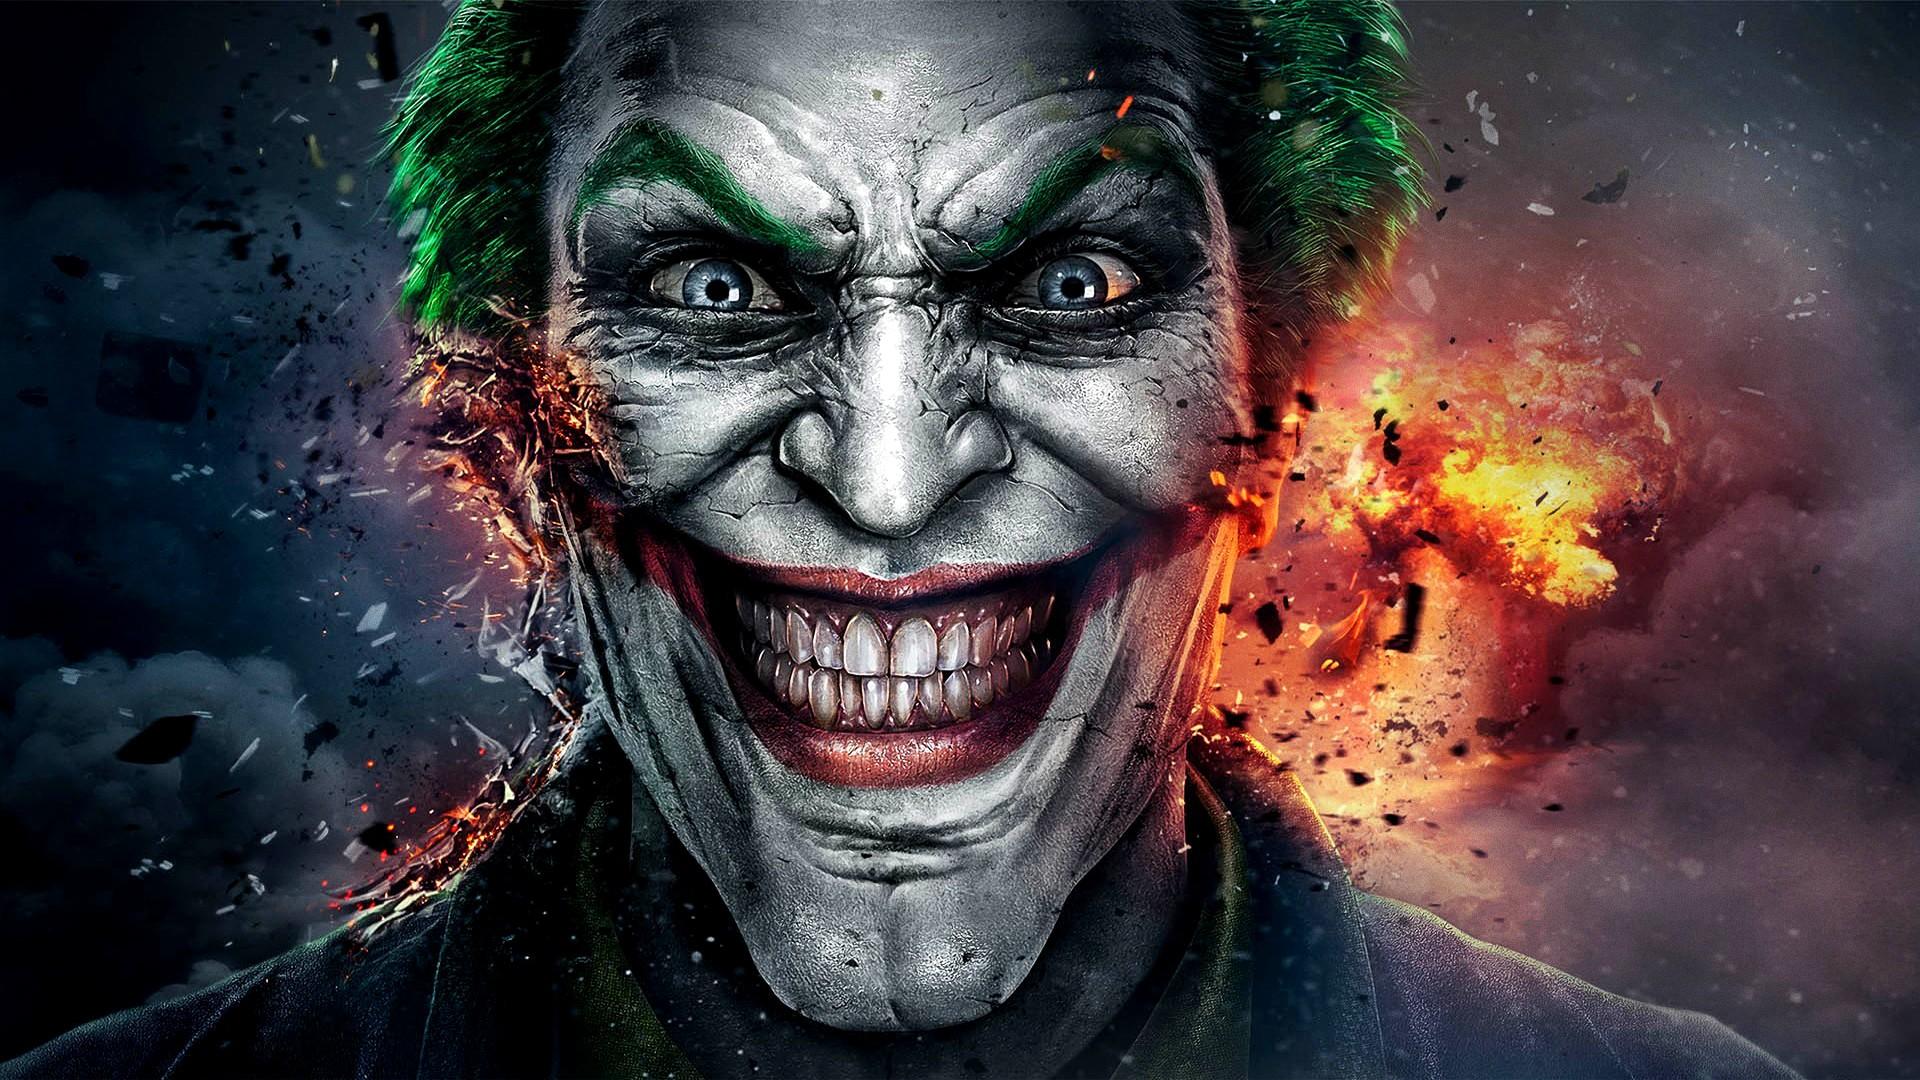 which batman movie has the joker